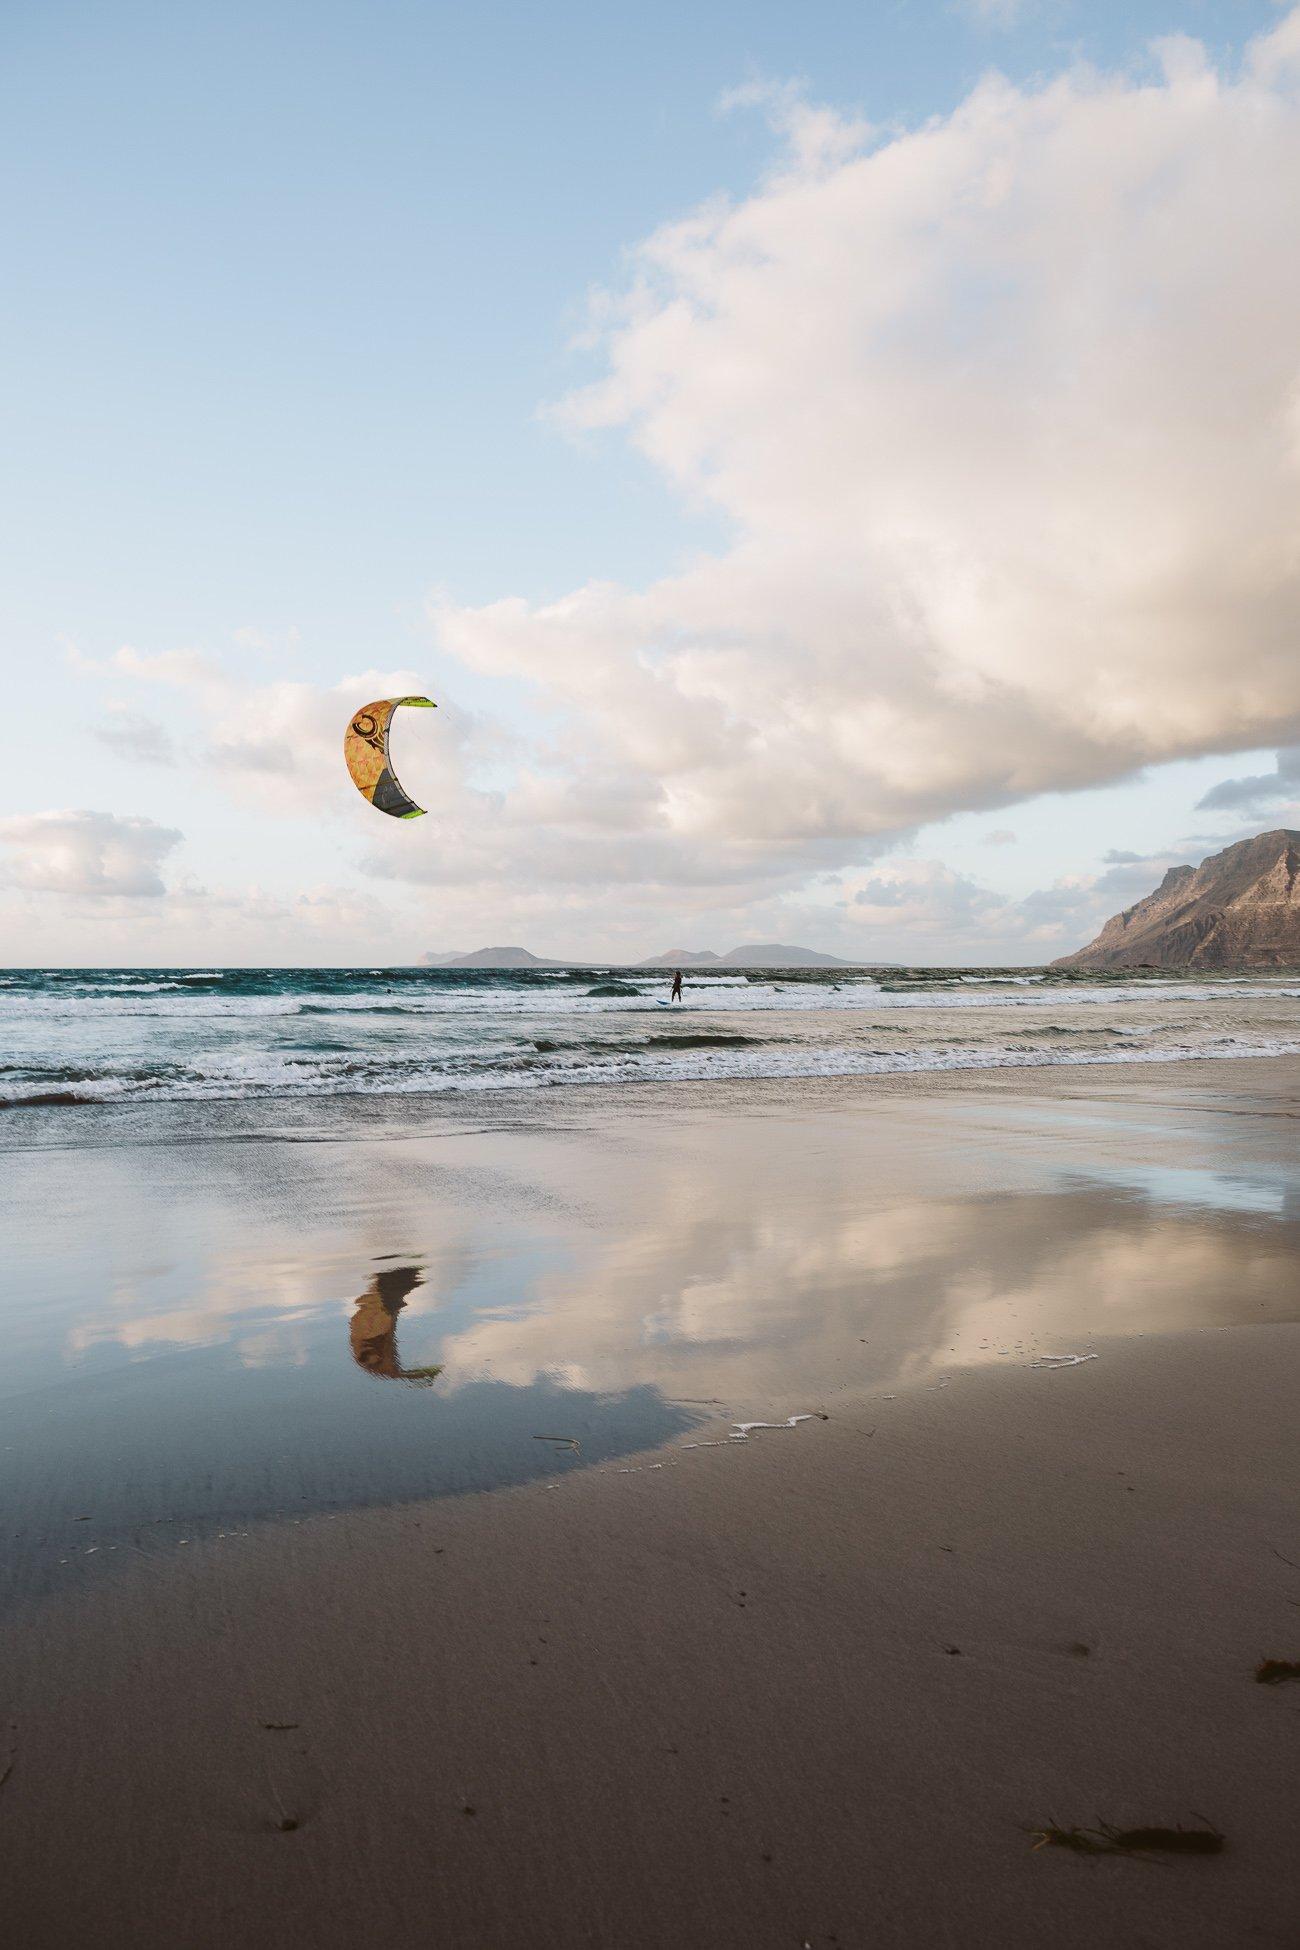 Kite surfer at Famara beach Lanzarote